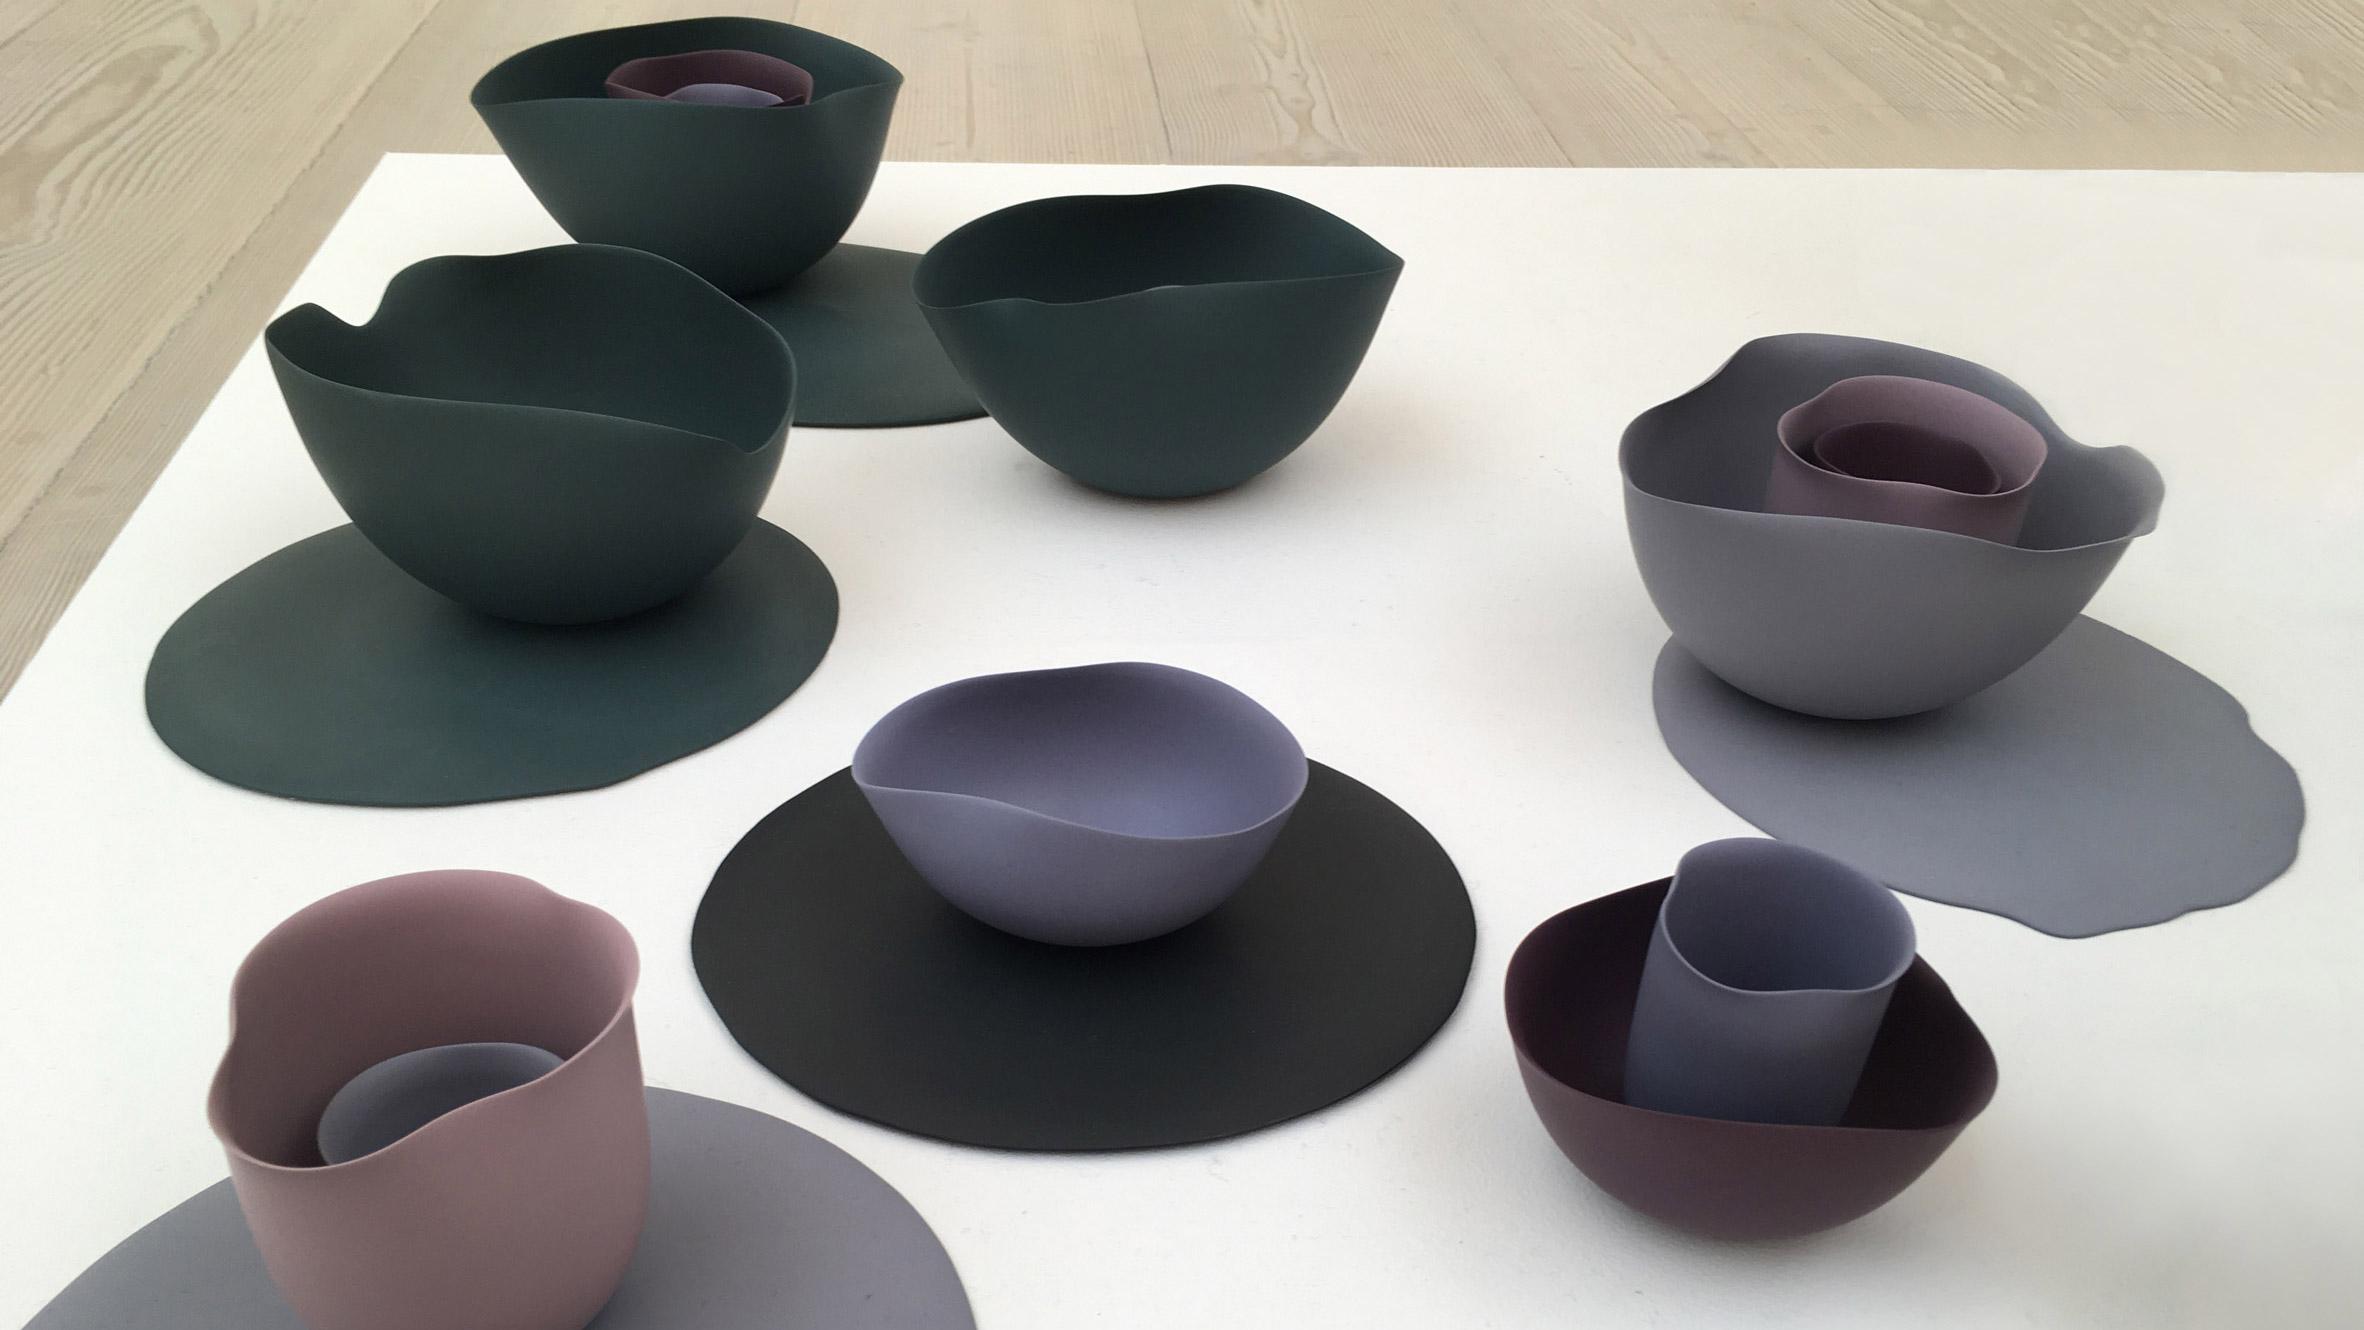 Seo-Yeon Park bases porcelain tableware on Georgia O'Keeffe paintings